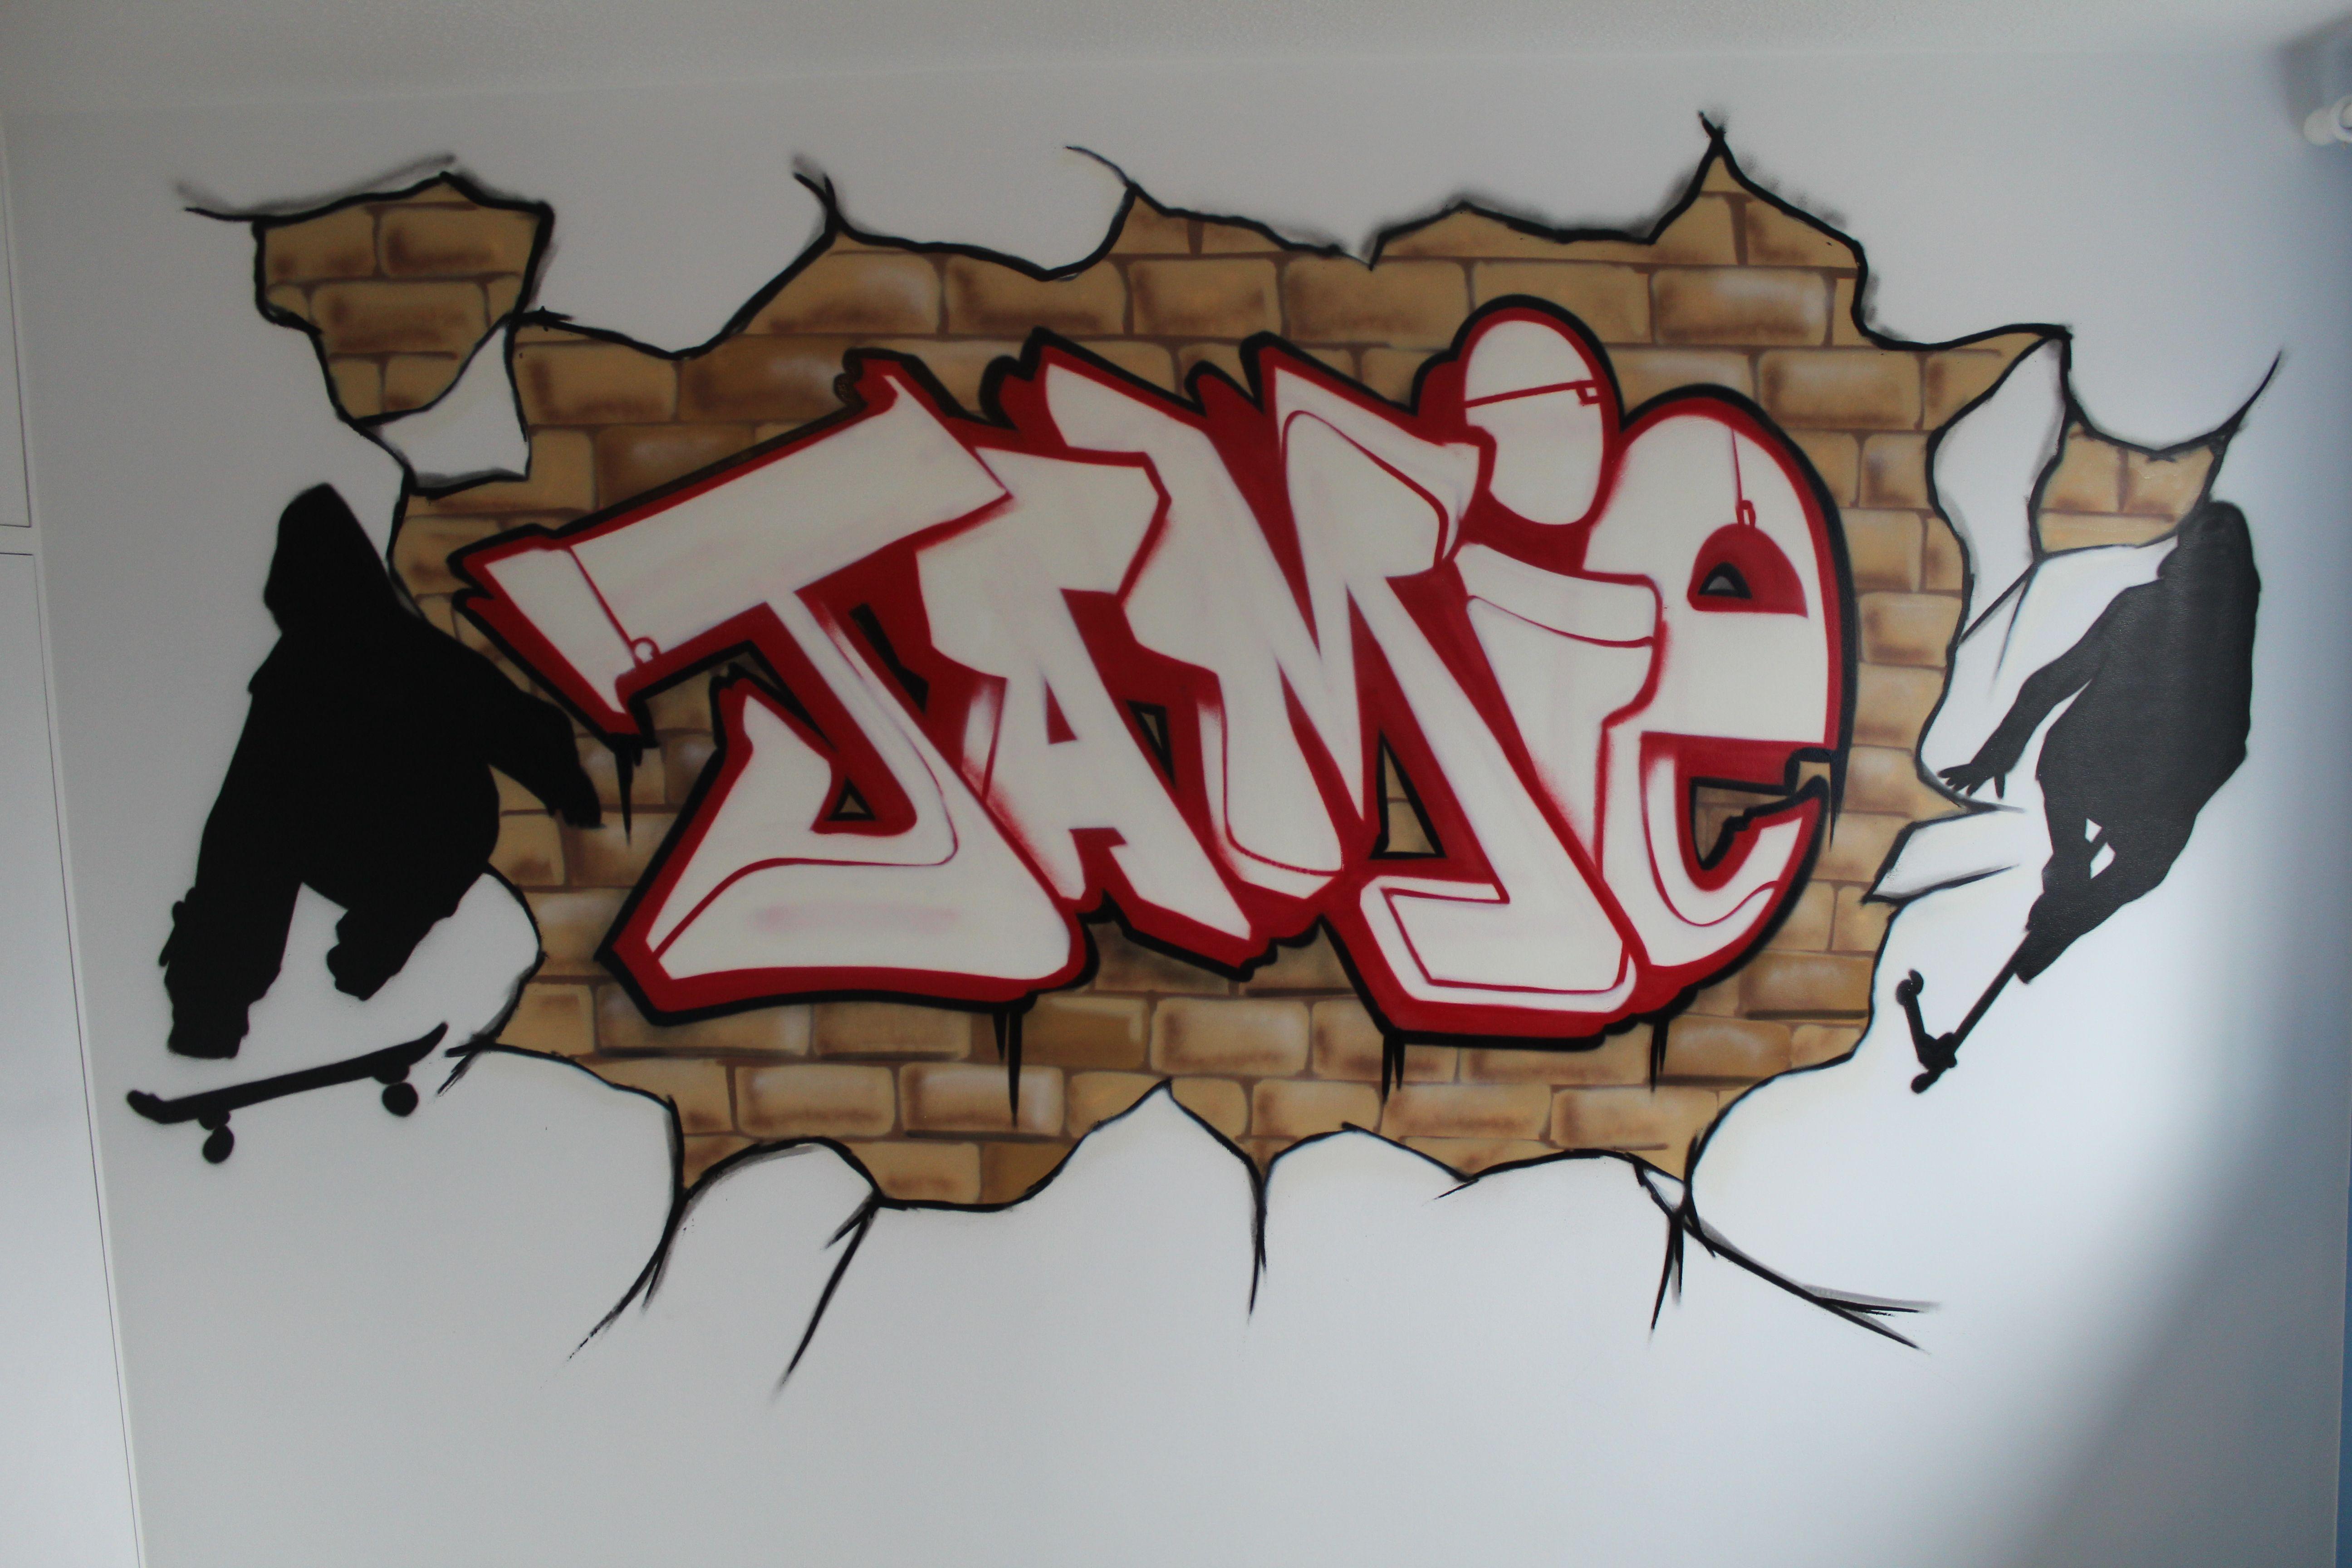 5184x3456 Graffiti Murals For Bedrooms Brick Wall Graffiti Bedrooms